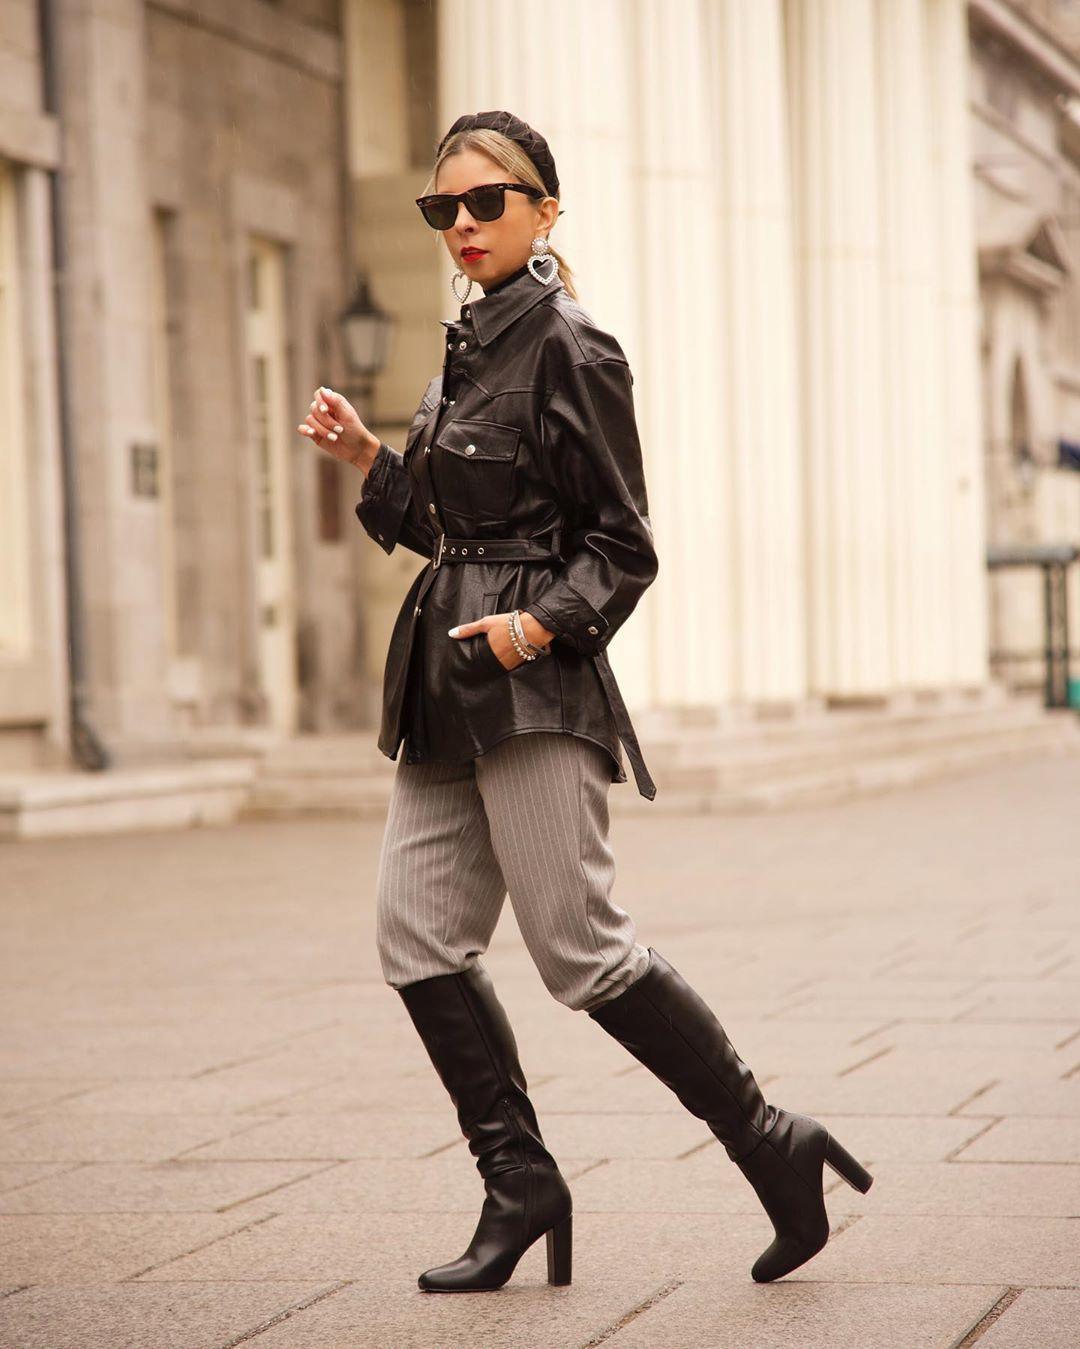 jacket black leather jacket black boots knee high boots striped pants